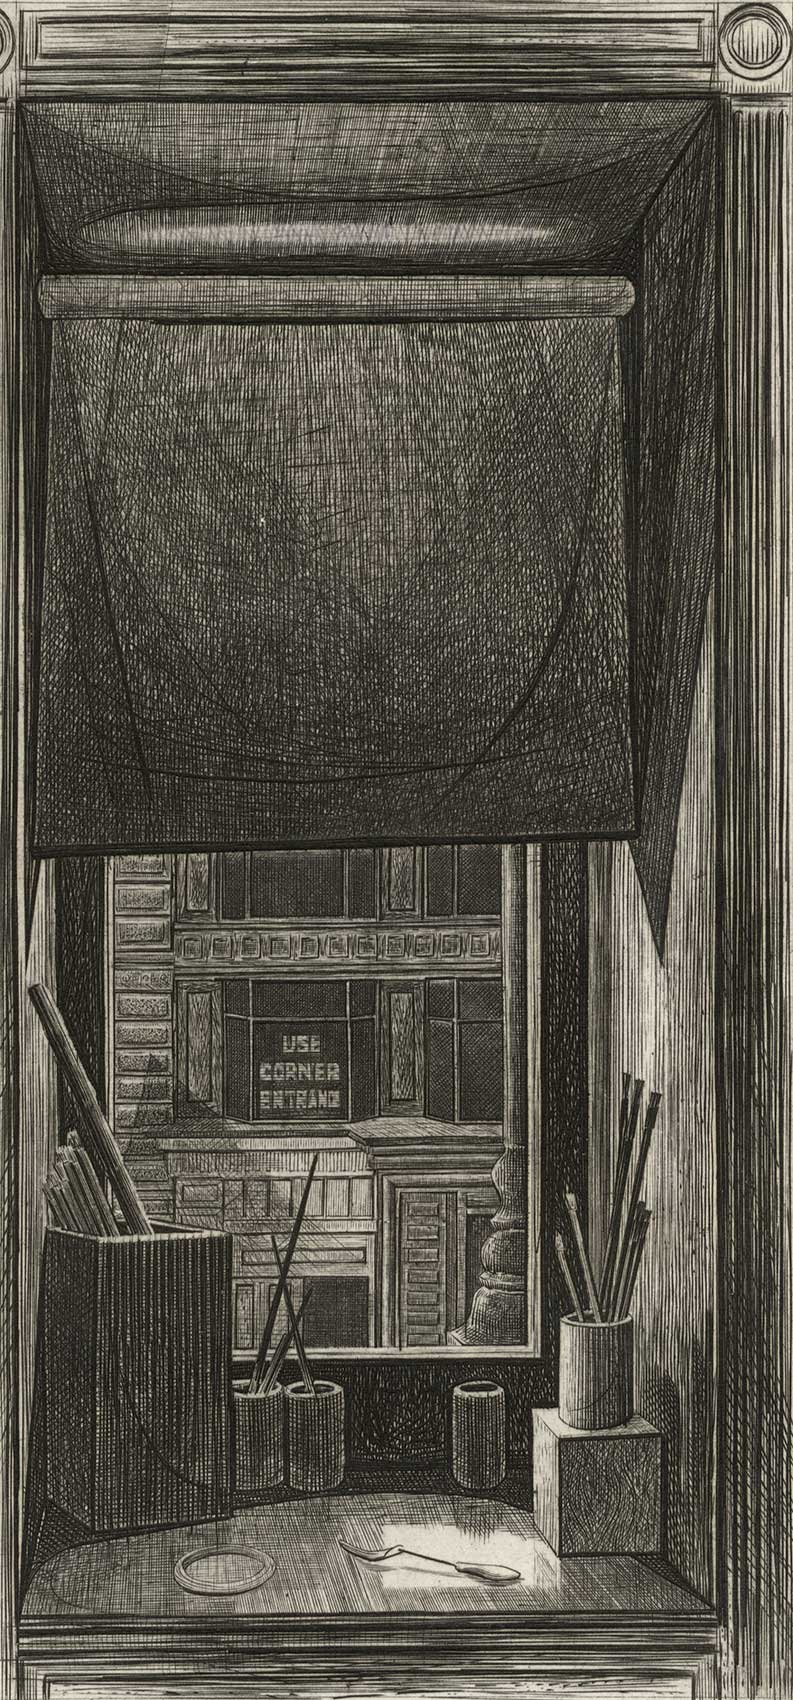 Window on 14th Street (Looking through artist's studio window/ brushes on desk)